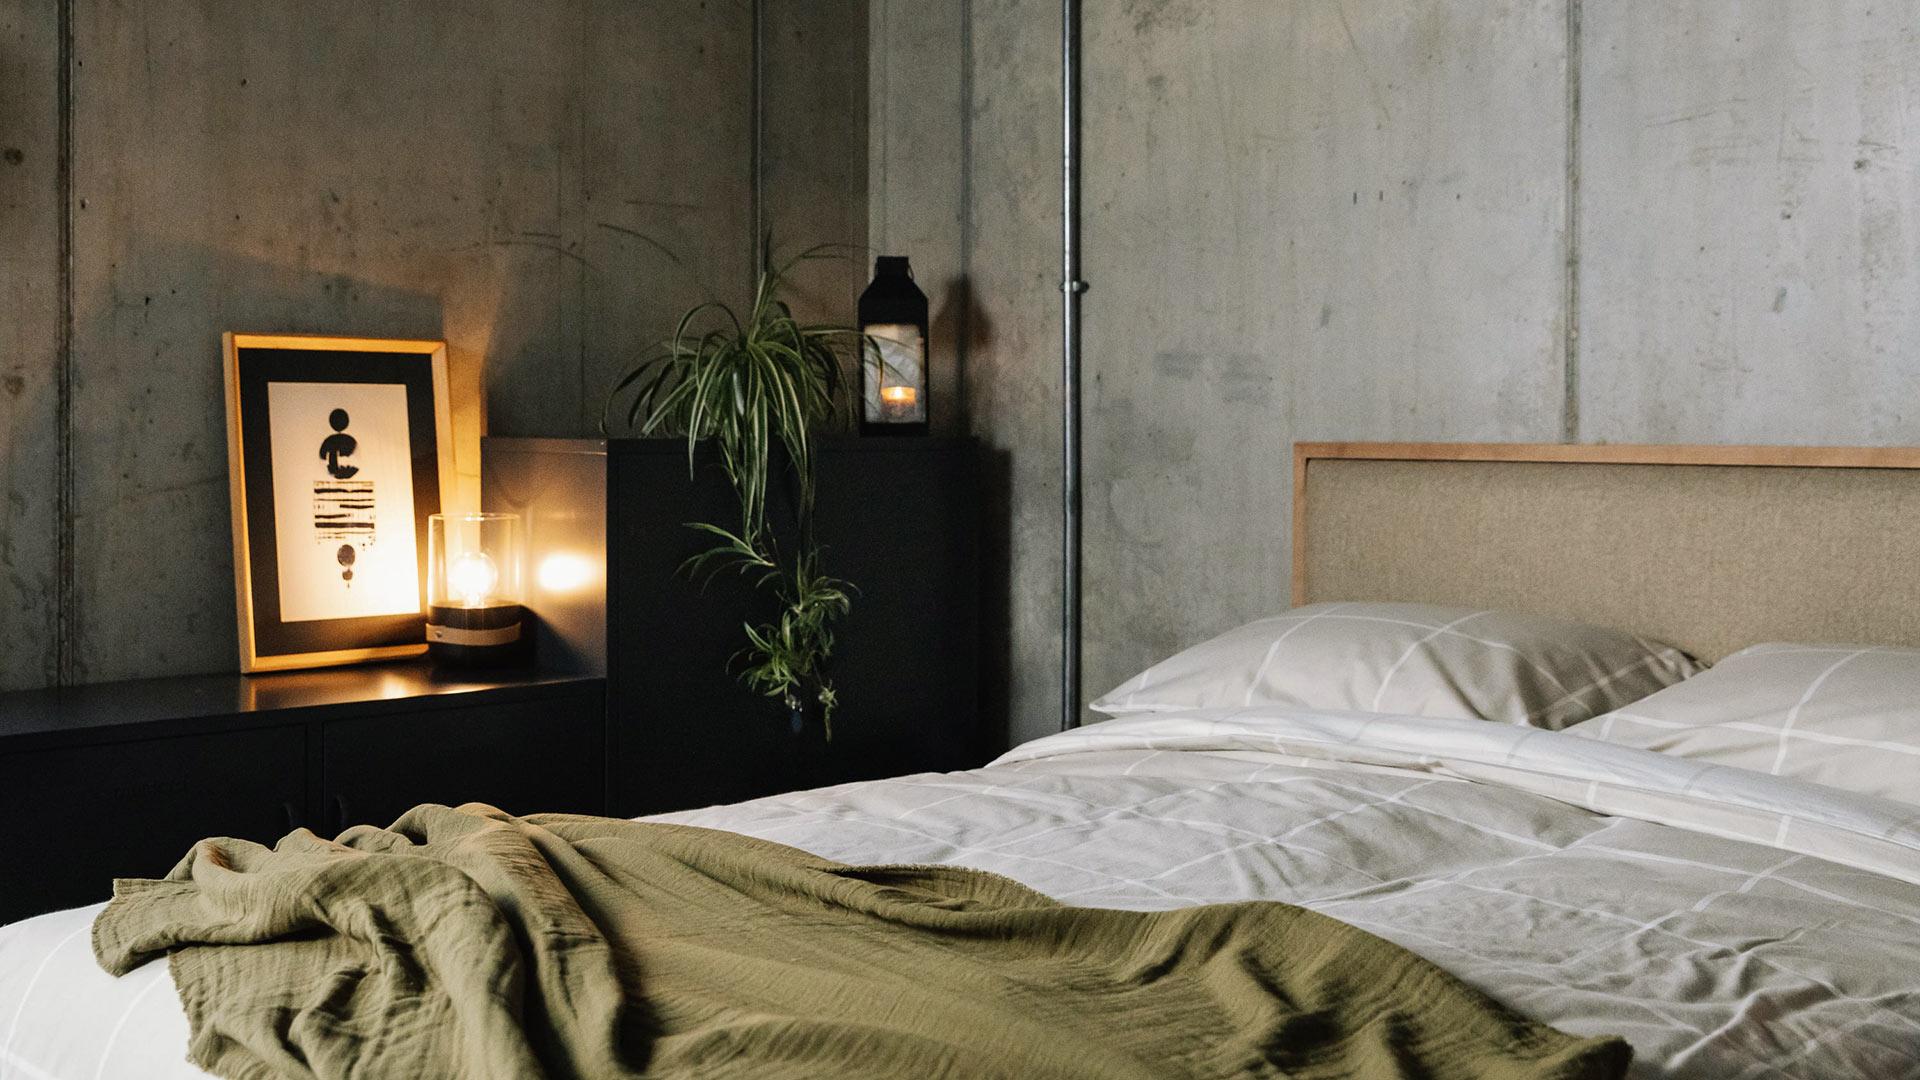 Strap Bedside Light in industrial look loft bedroom